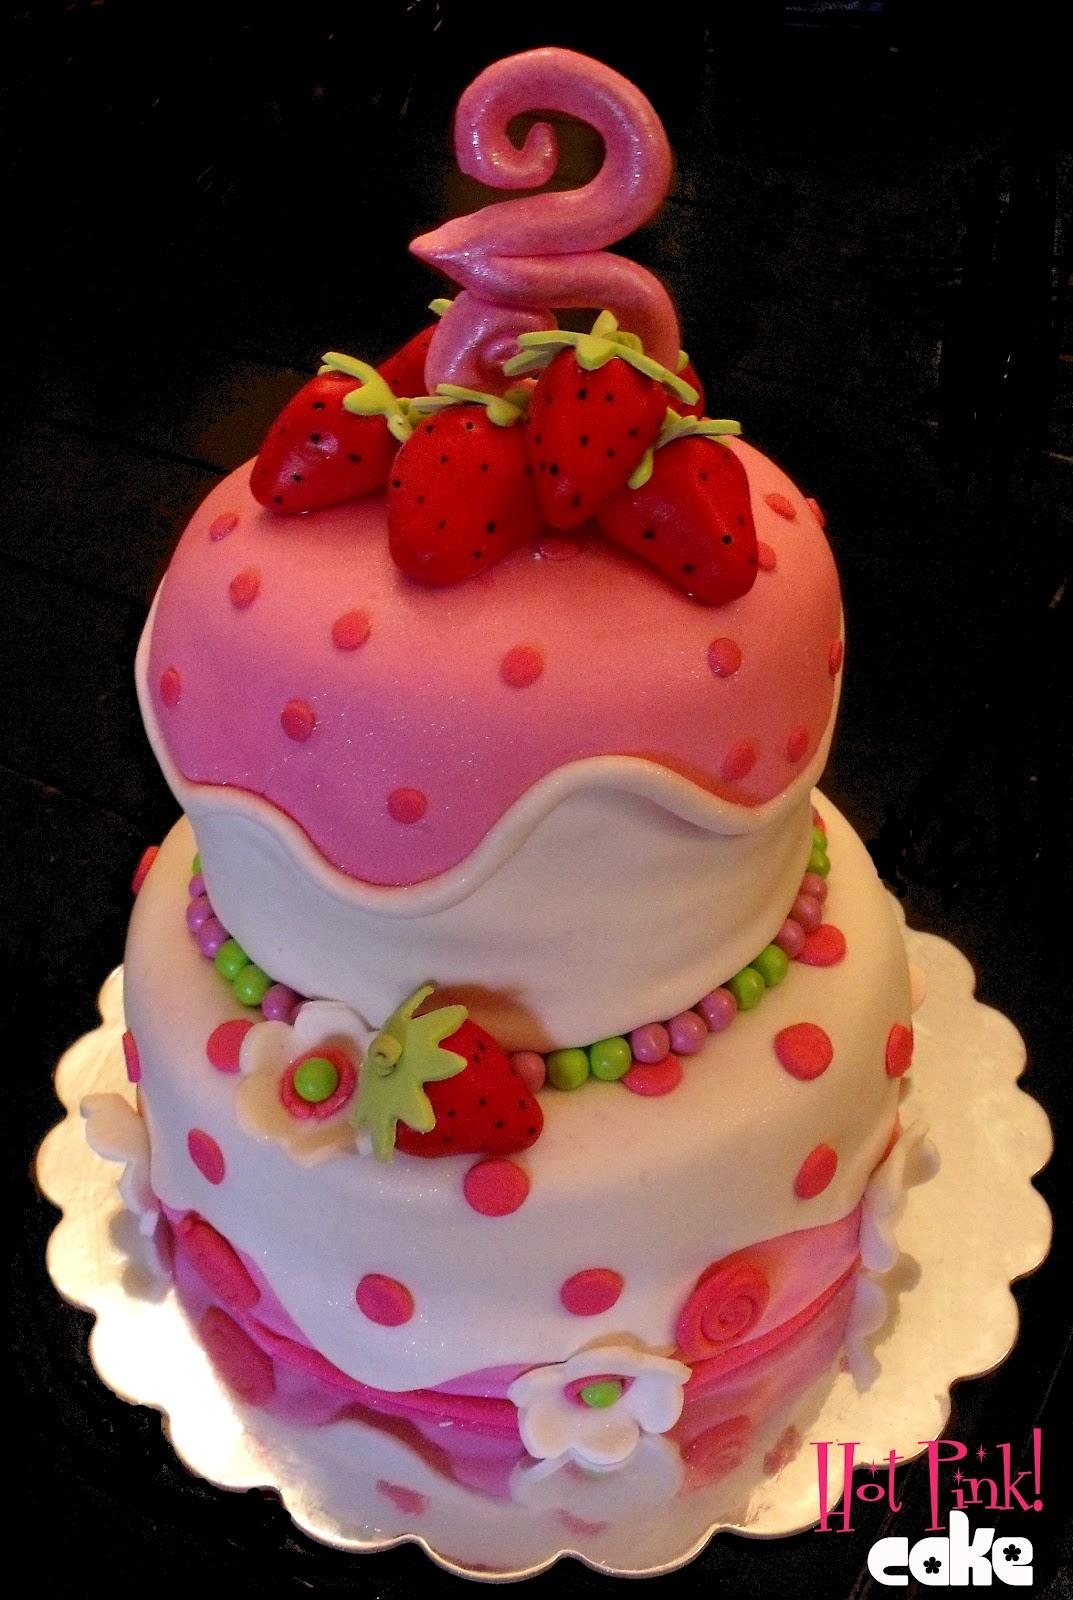 Hot Pink! Cakes: Strawberry Shortcake